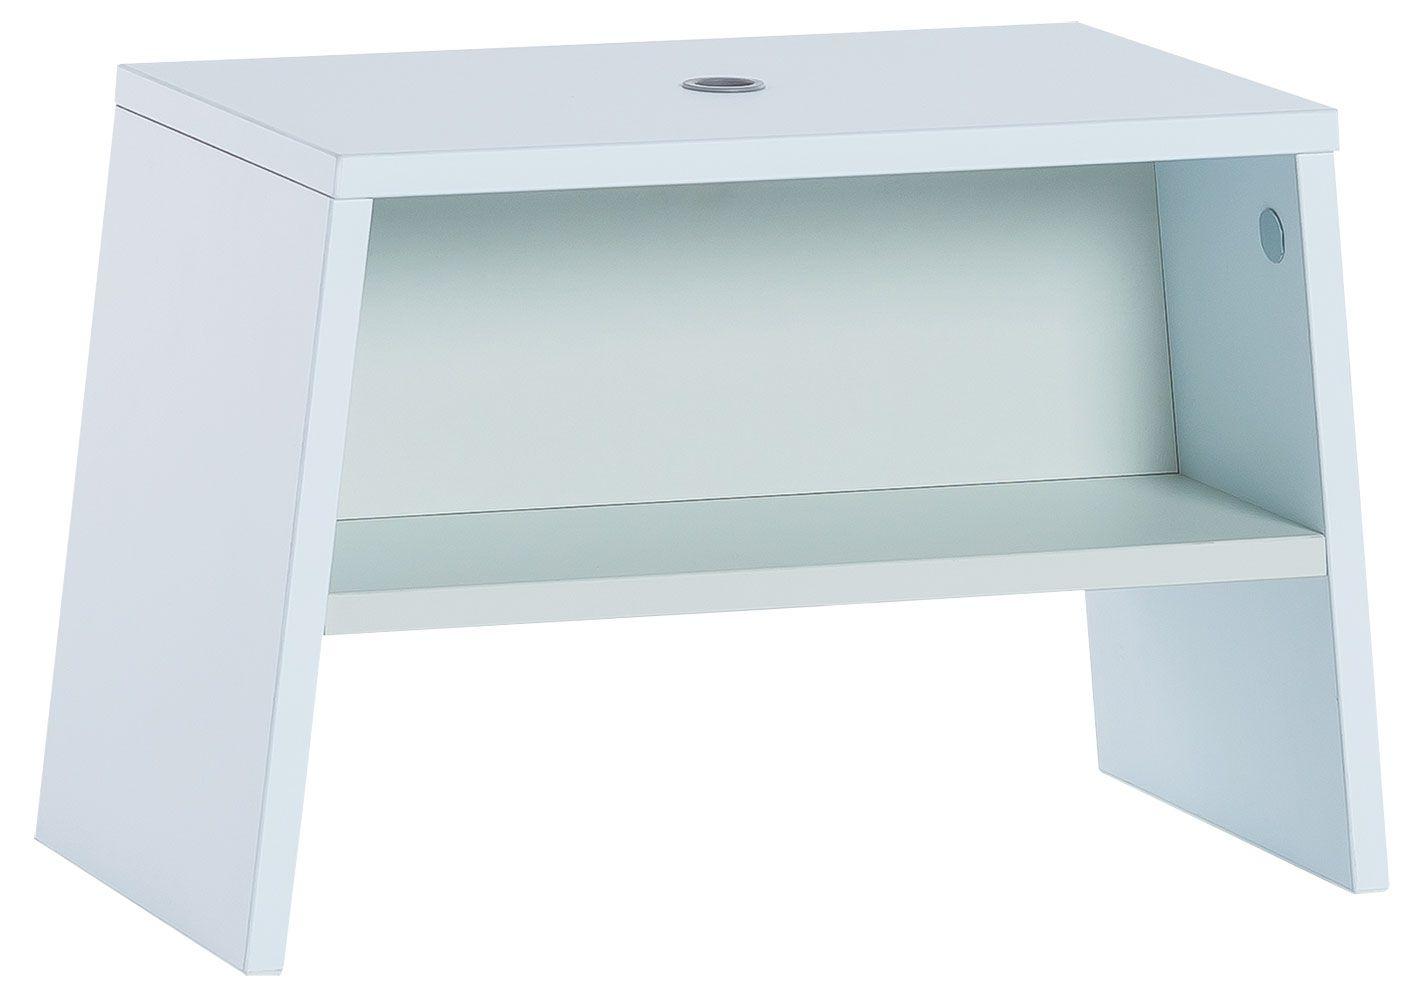 Kinderhocker Irlin 06, Farbe: Blau / Grün - Abmessungen: 31 x 46 x 25 cm (H x B x T)